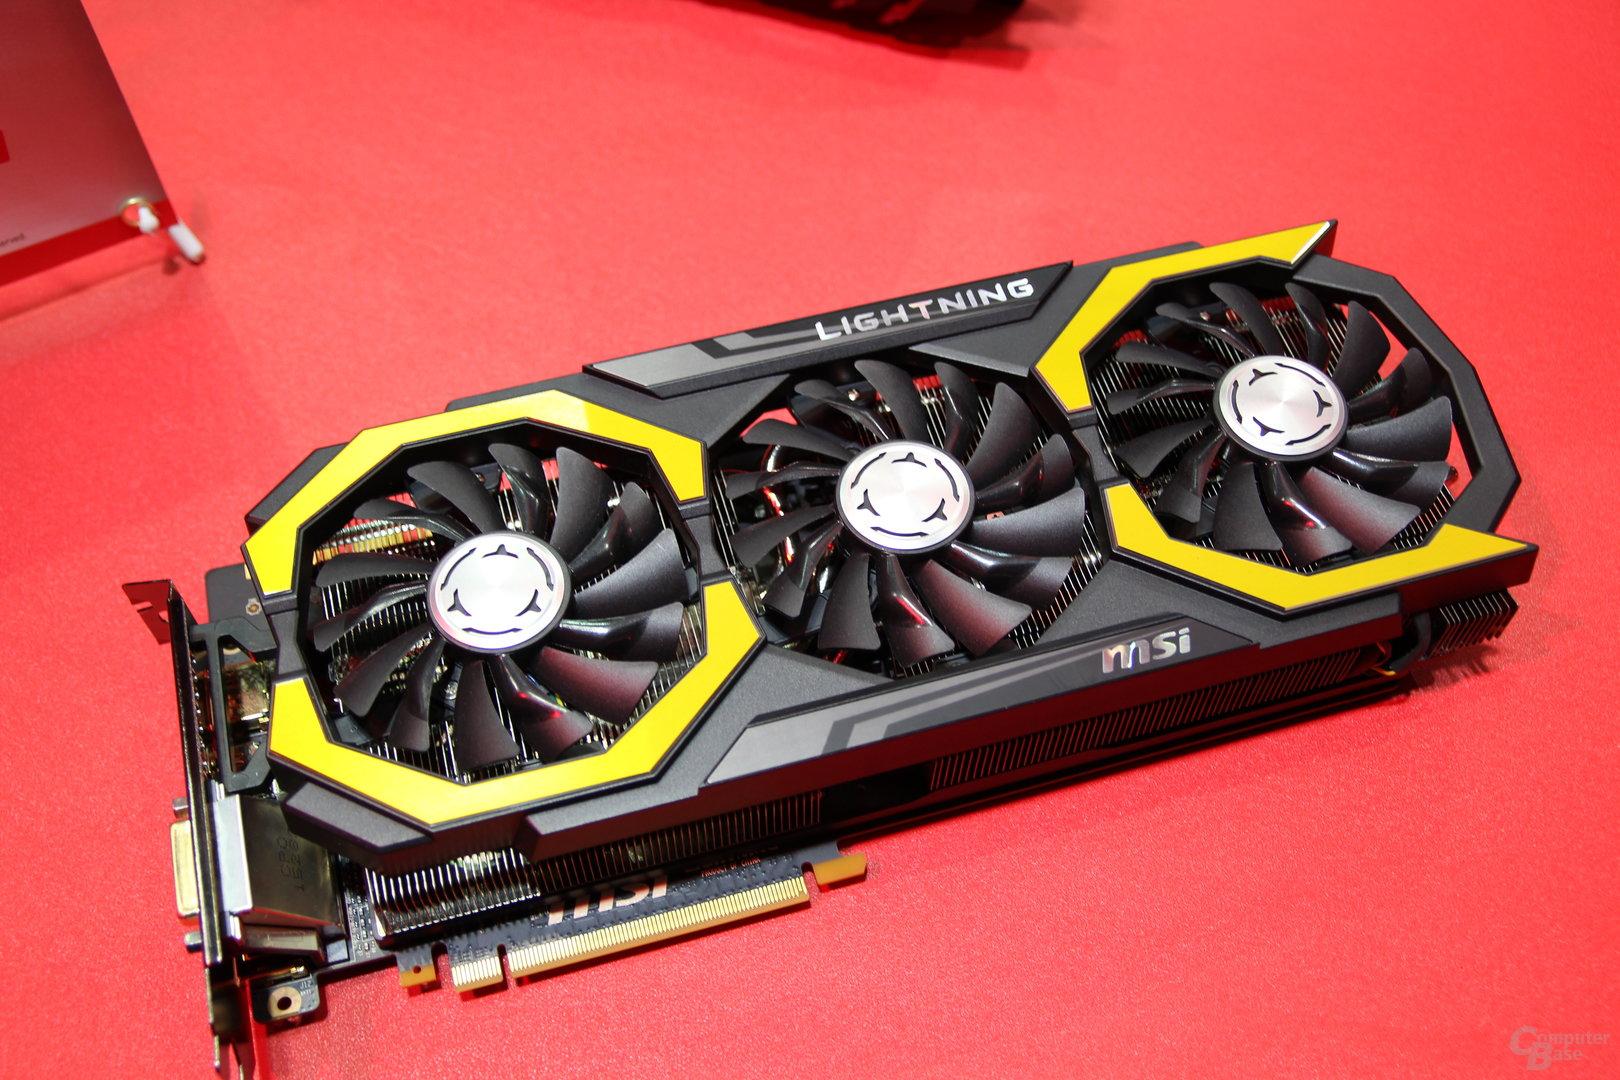 MSI GeForce GTX 1080 Lightning